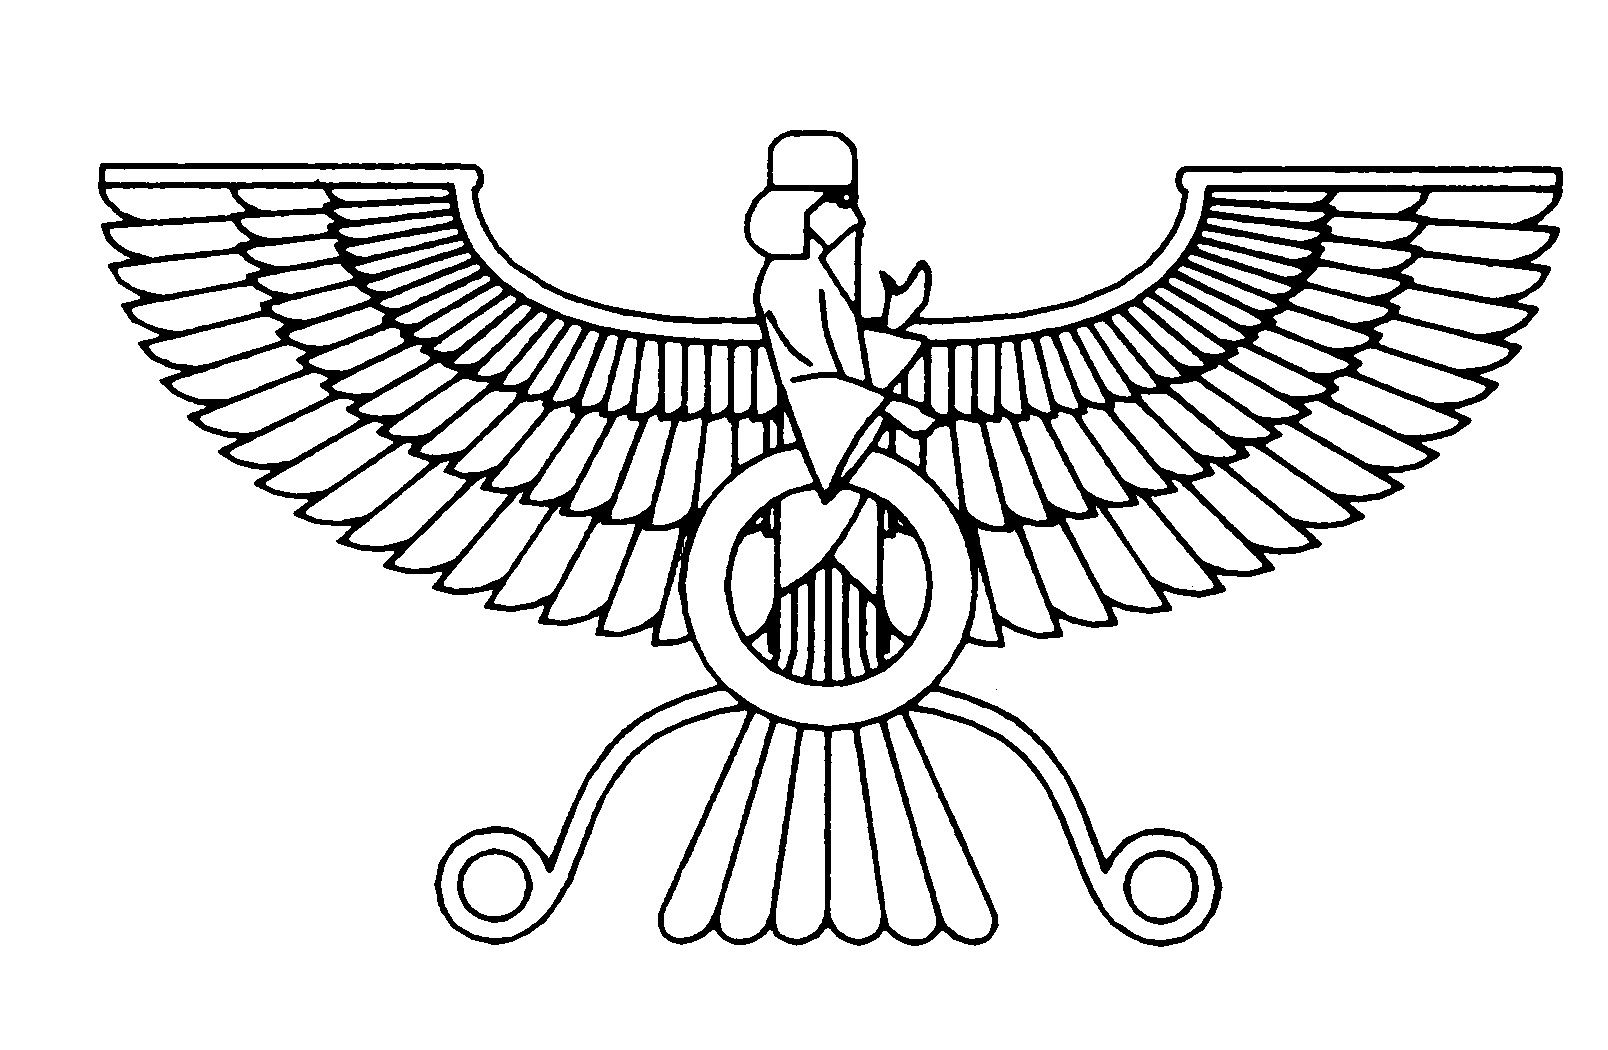 ahura mazda symbol - Recherche Google | First day of ...